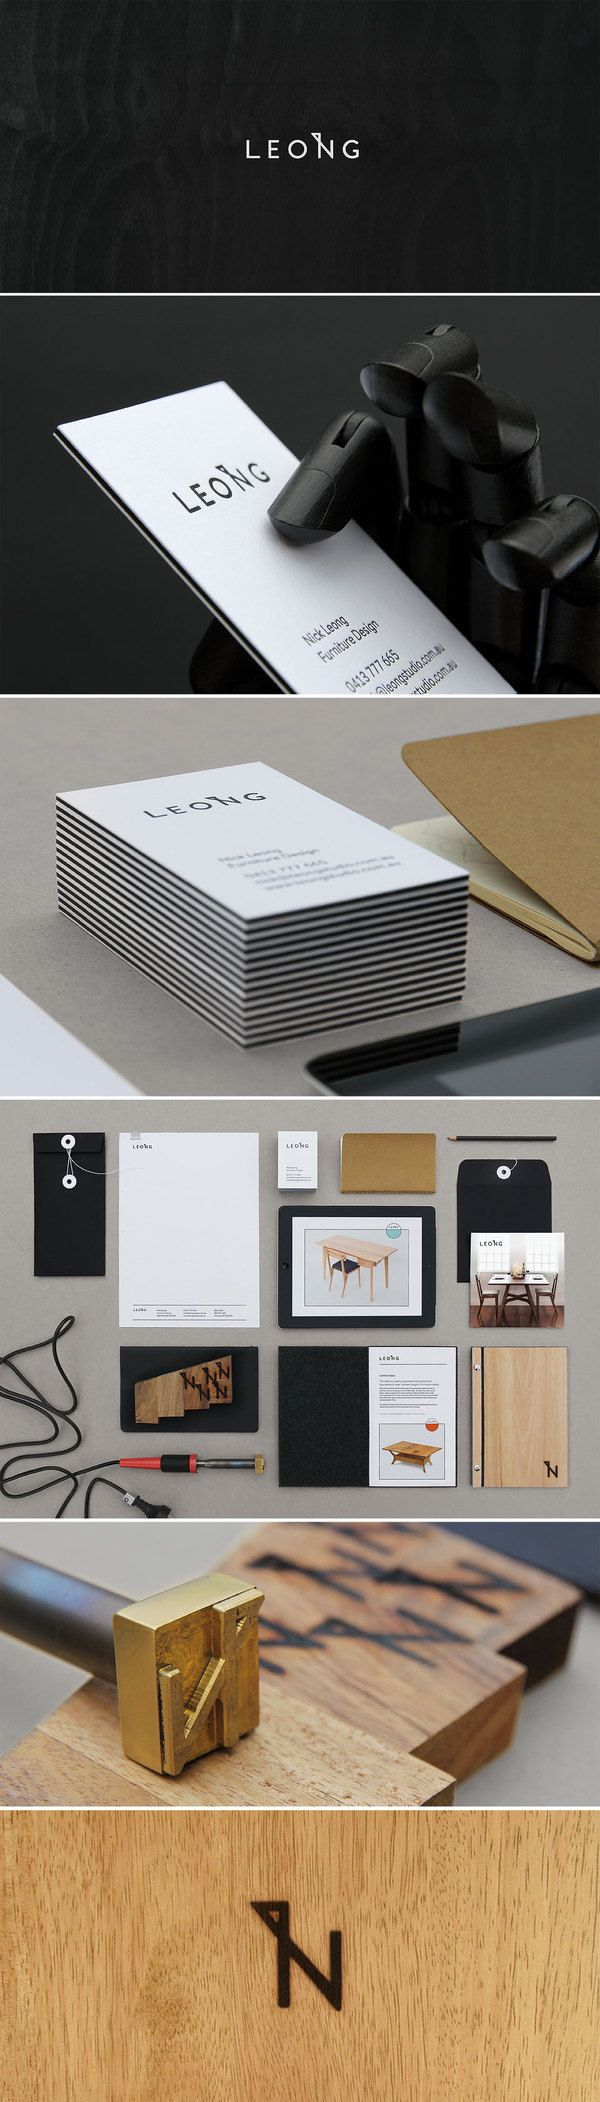 Leong brand ID | #stationary #corporate #design #corporatedesign #identity #branding #marketing repinned by www.BlickeDeeler.de | Visit our website: www.blickedeeler.de/leistungen/corporate-design